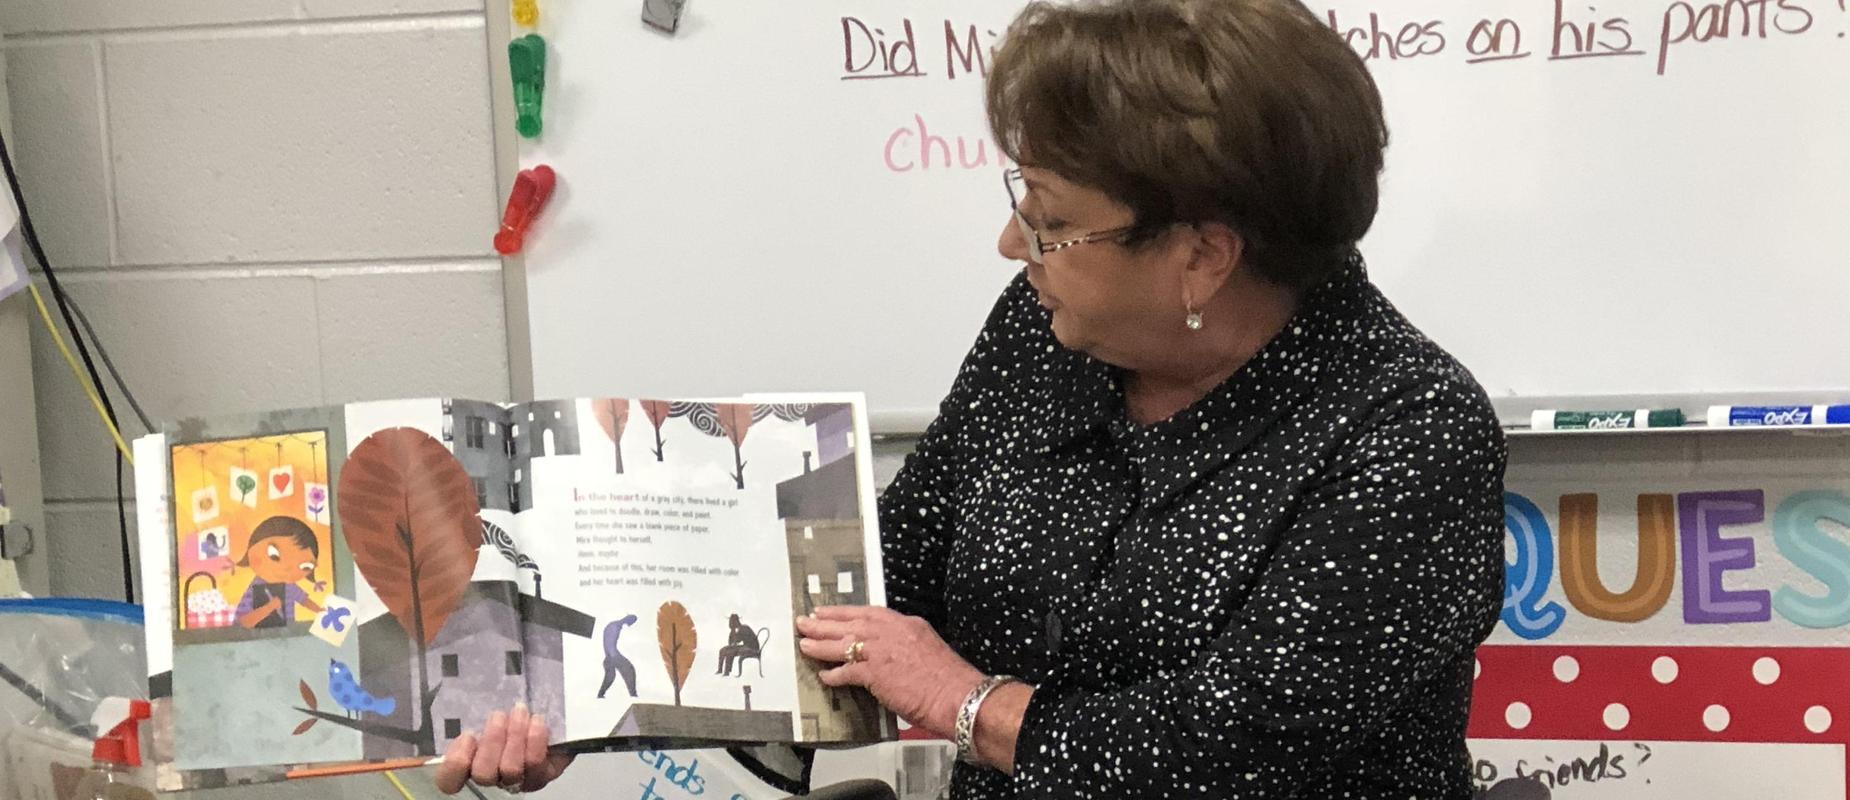 Ms. Dunson reading